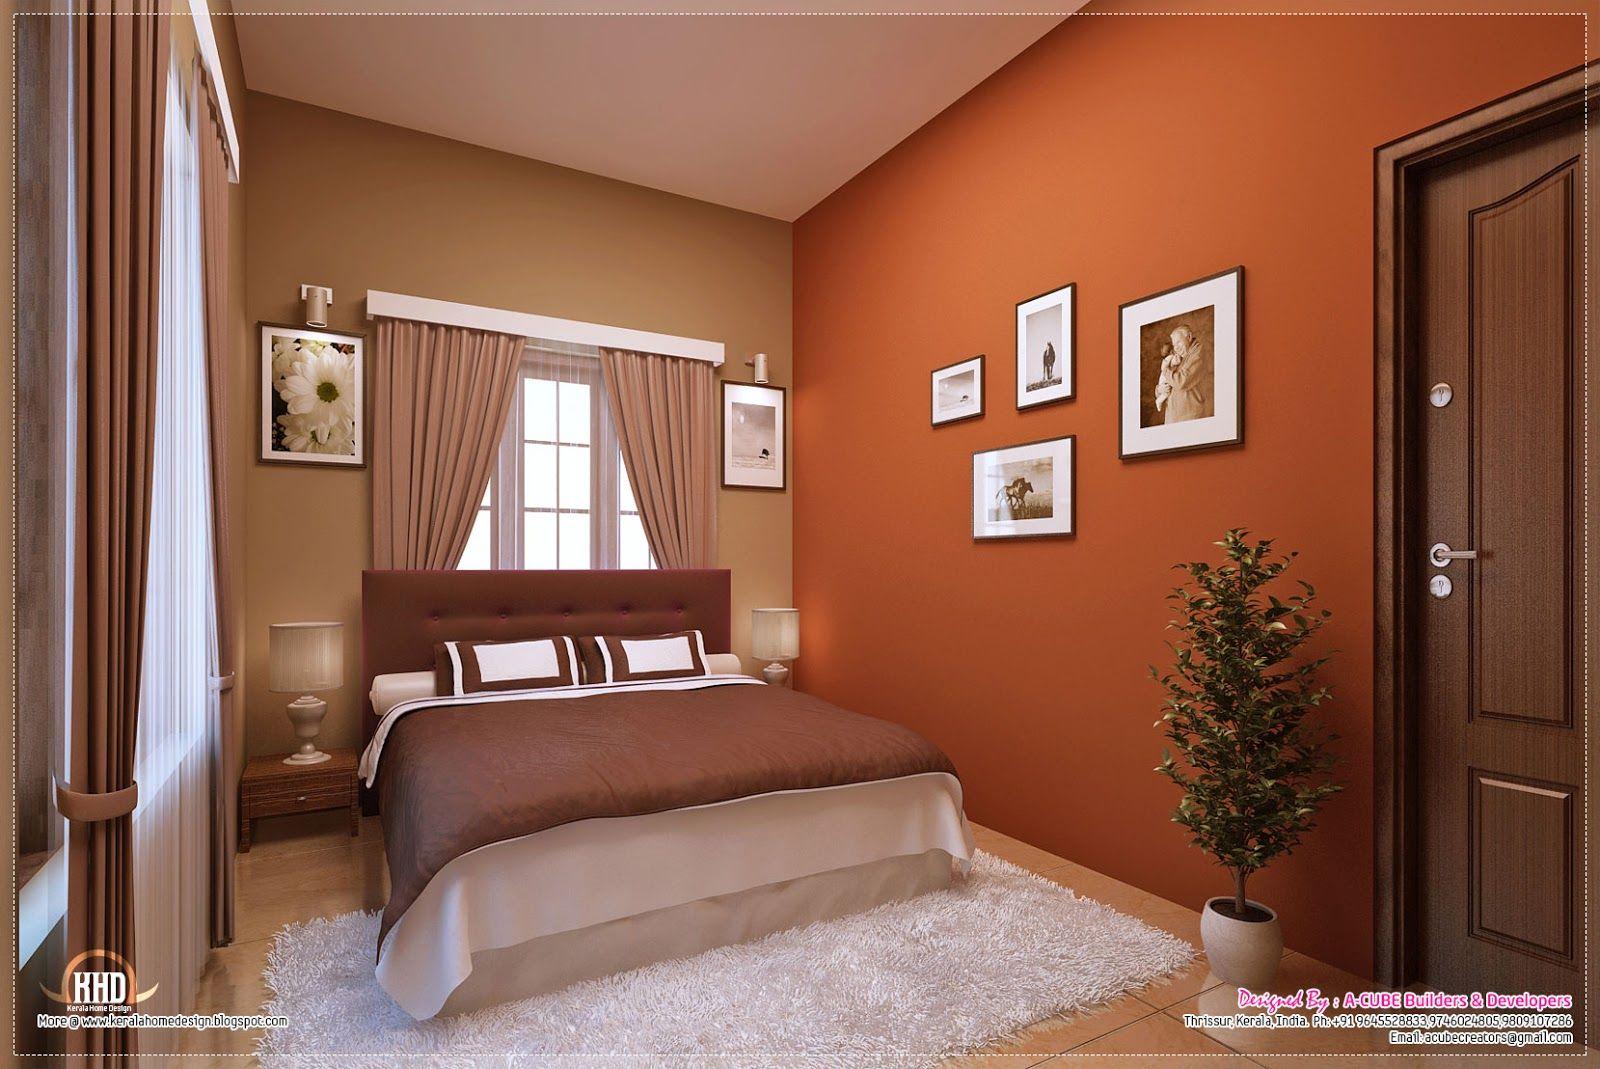 Master bedroom | Small bedroom interior, Indian bedroom ...